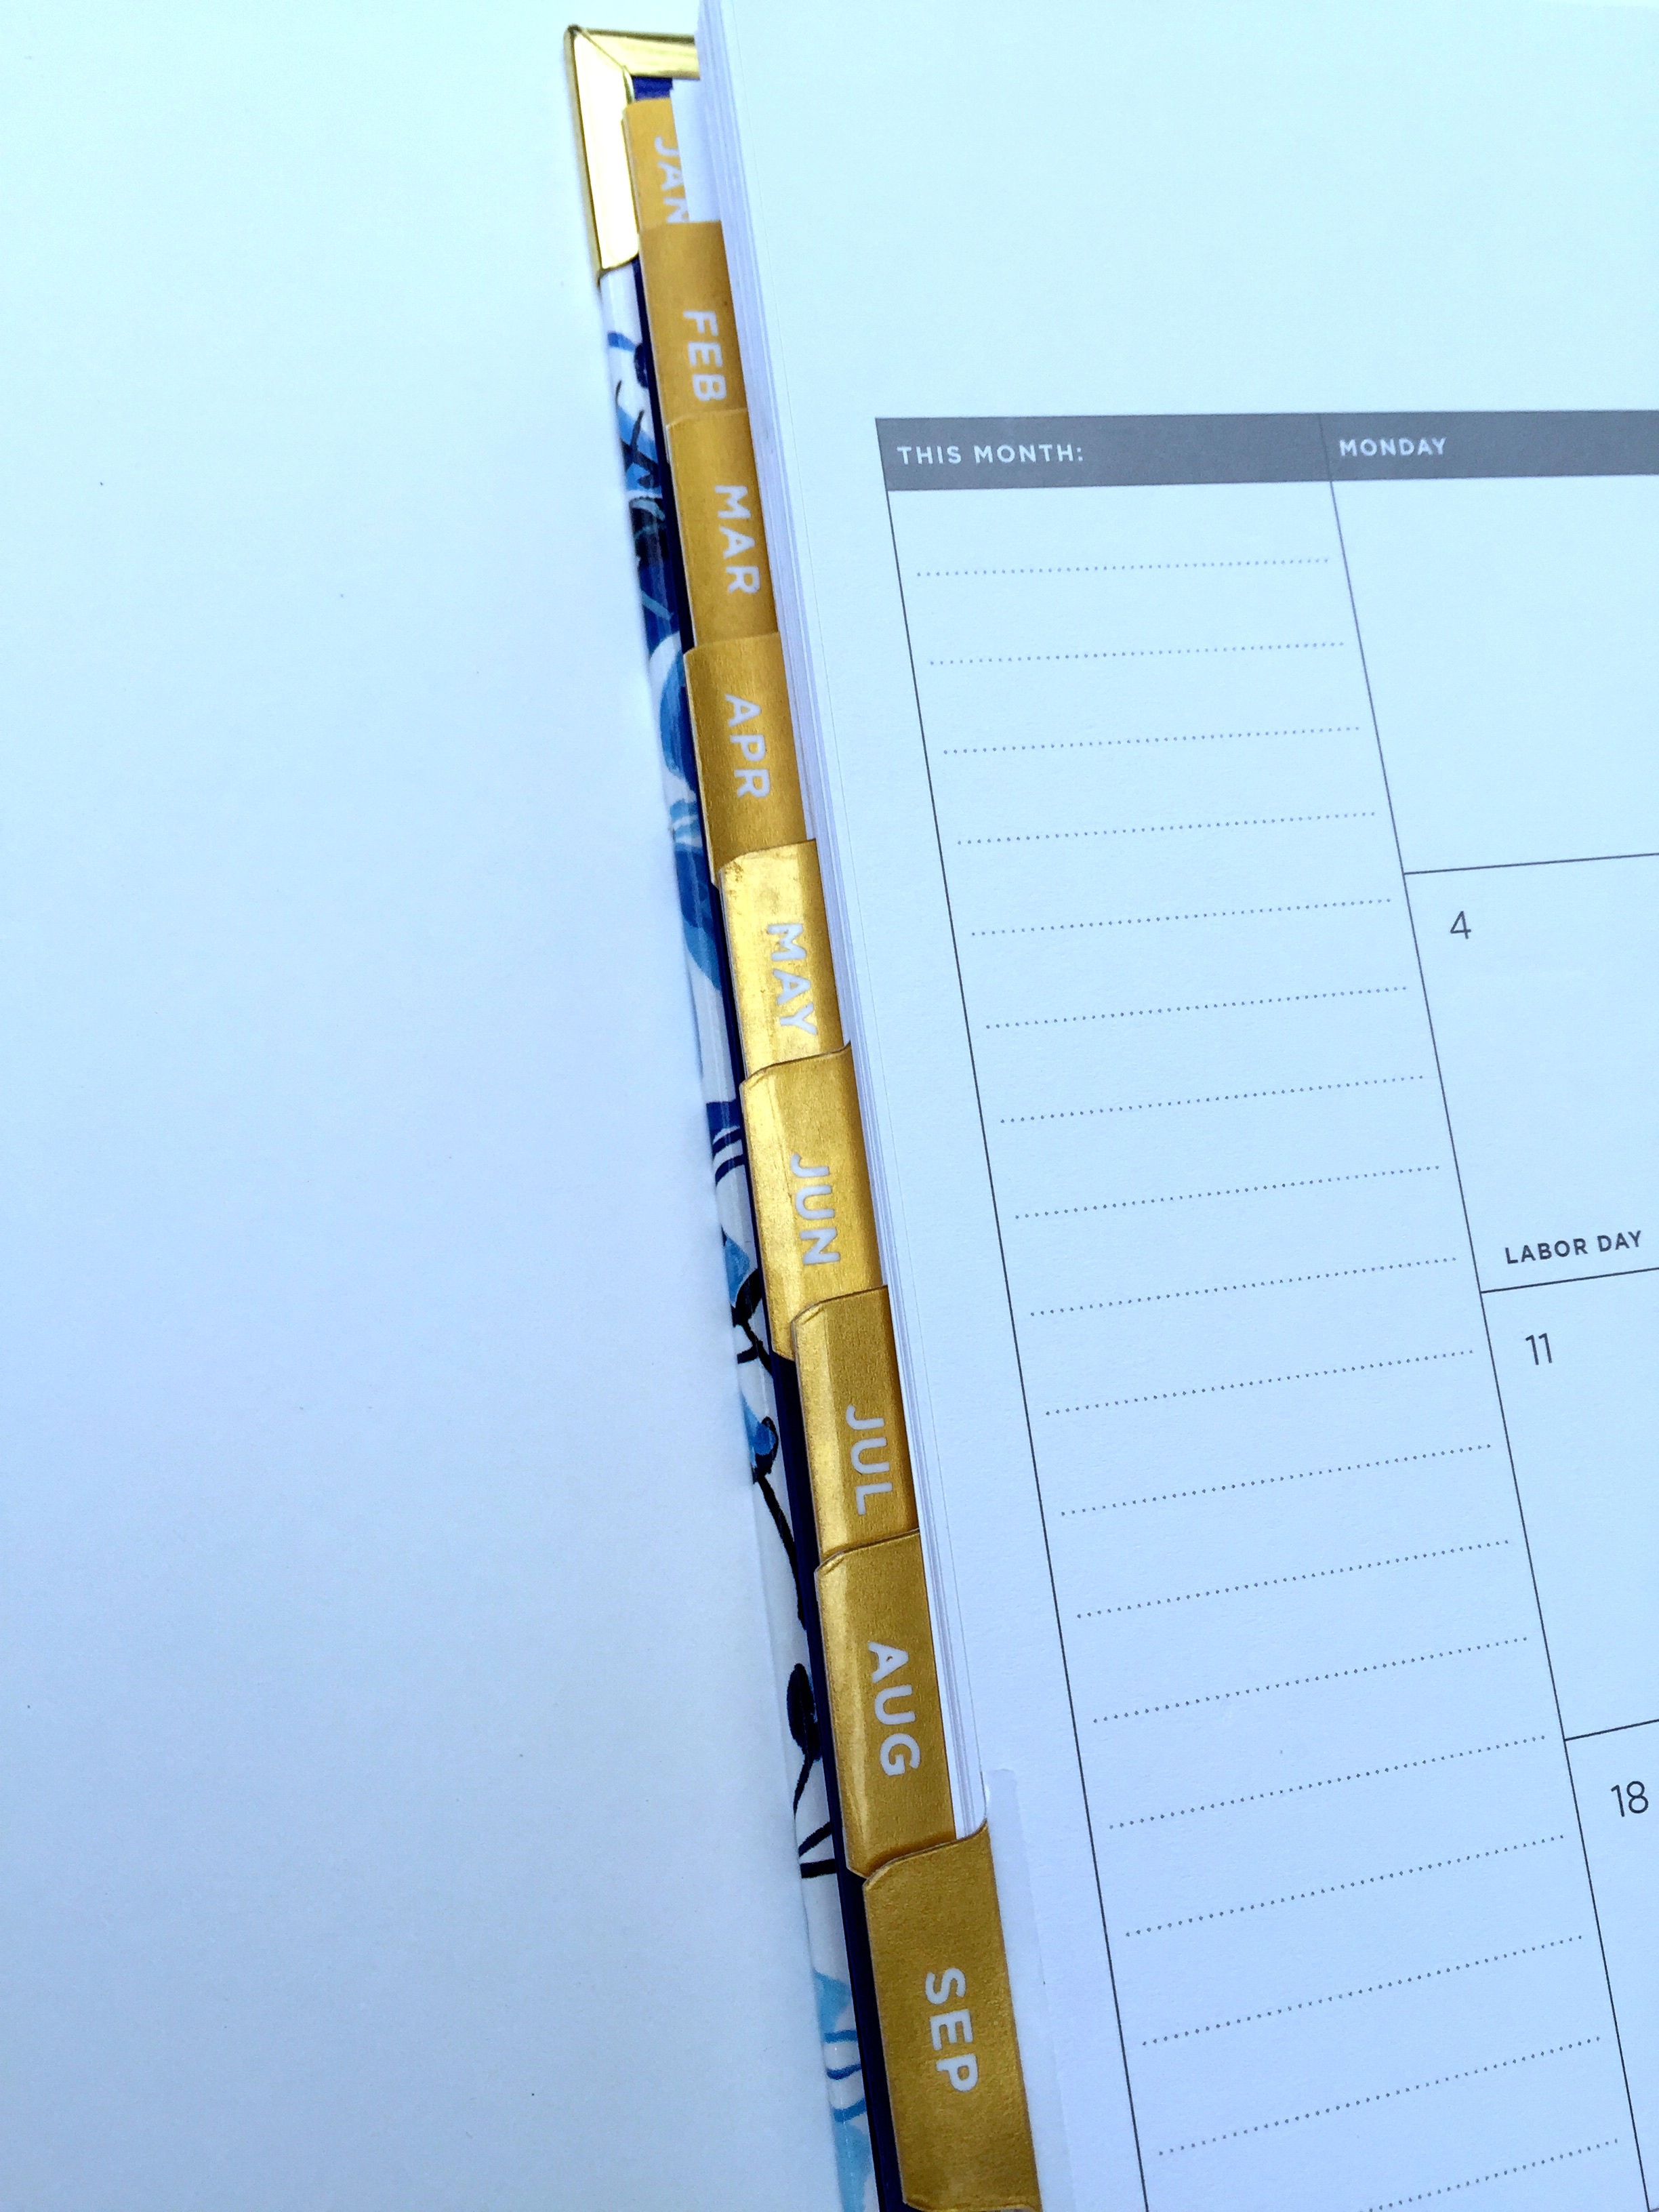 Monthly Calendar in the Day Designer Planner